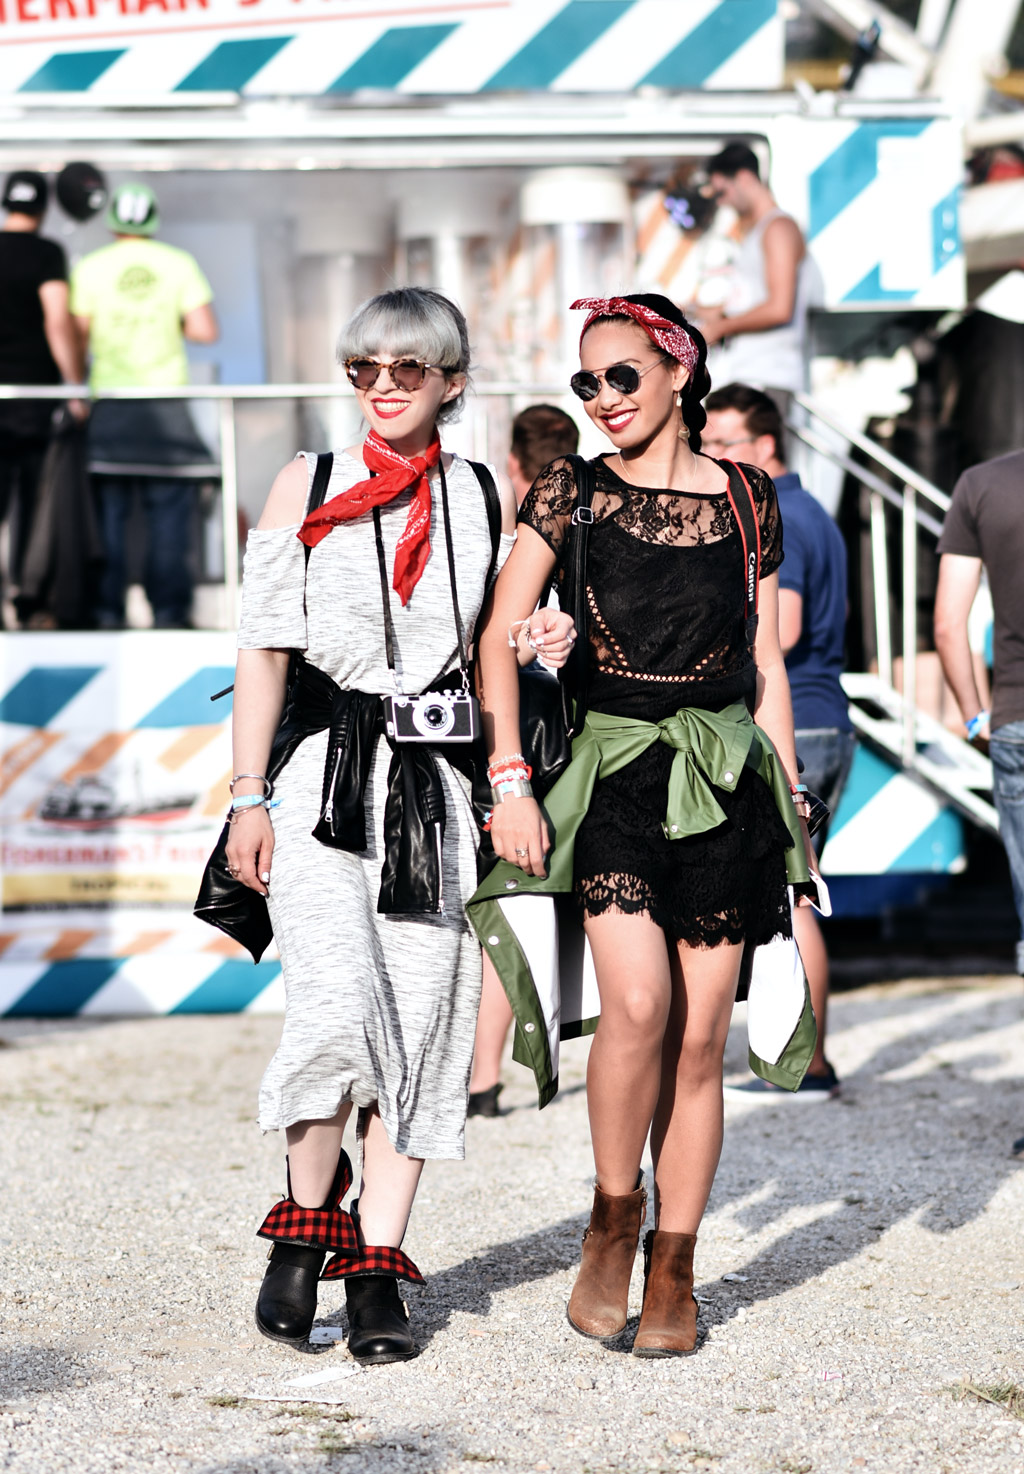 thefashionanarchy_nachgestern_utopia_island_festival_summer_sommer_outfit_look_style_lacedress_spitzenkleid_sorel_boots_munich_muenchen_fashionblog_modeblog-styleblog_lifestyleblog_1